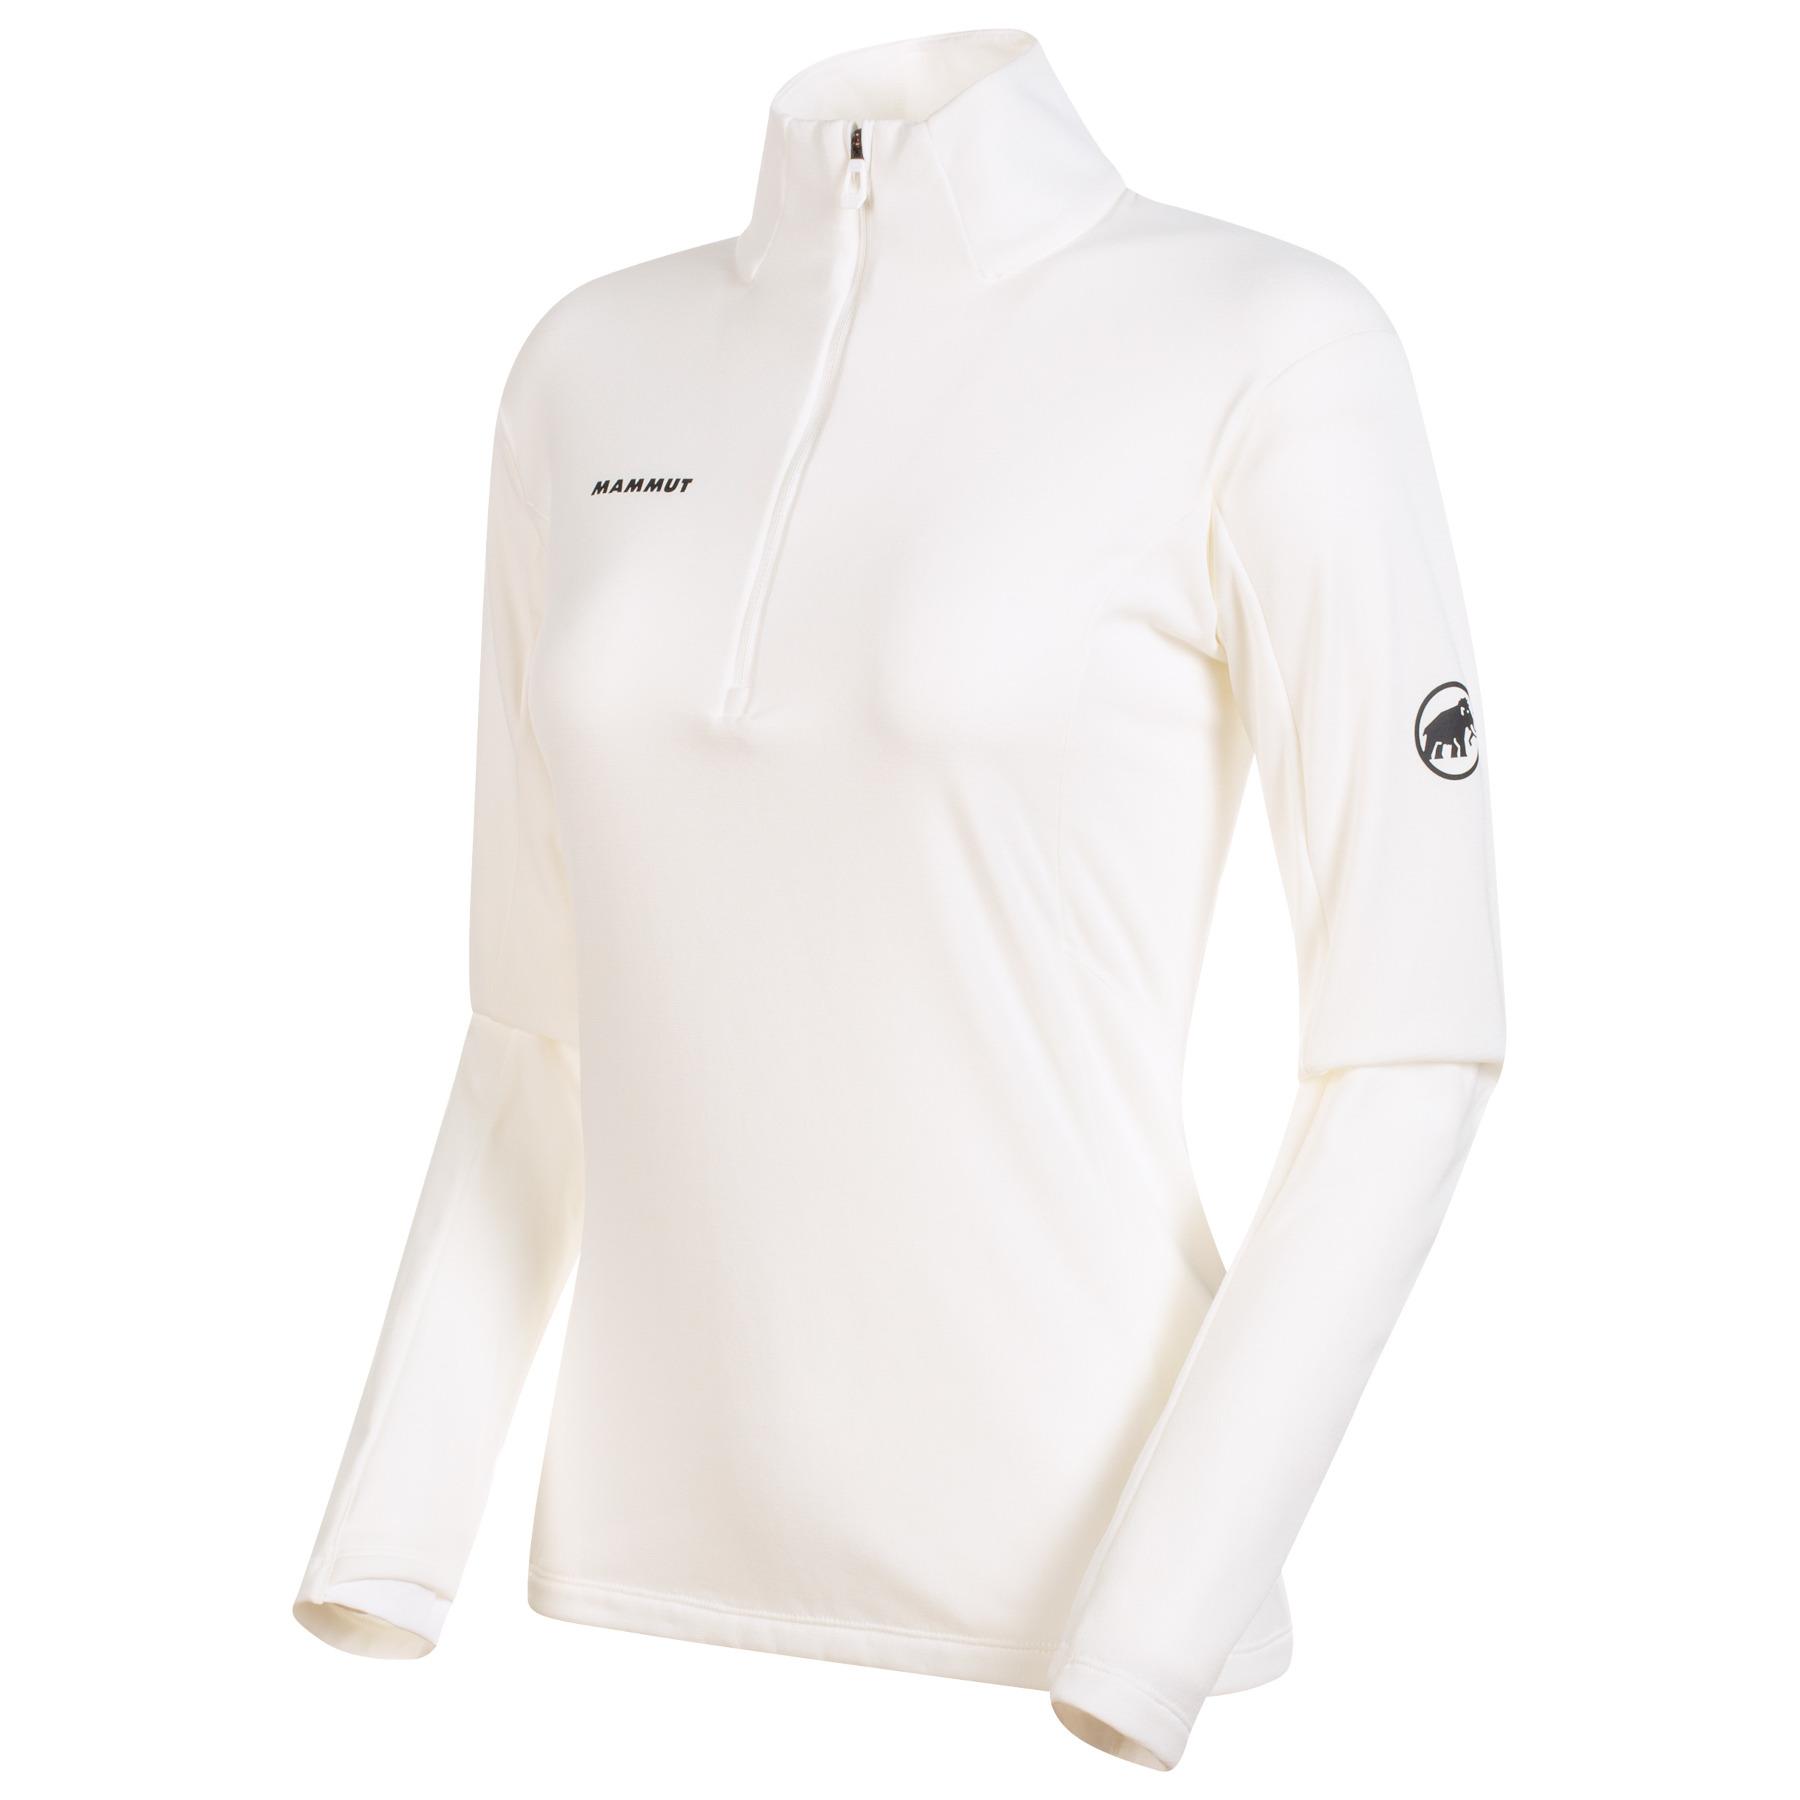 Mammut Moench Advanced Half Zip Damen Langarmshirt - bright white